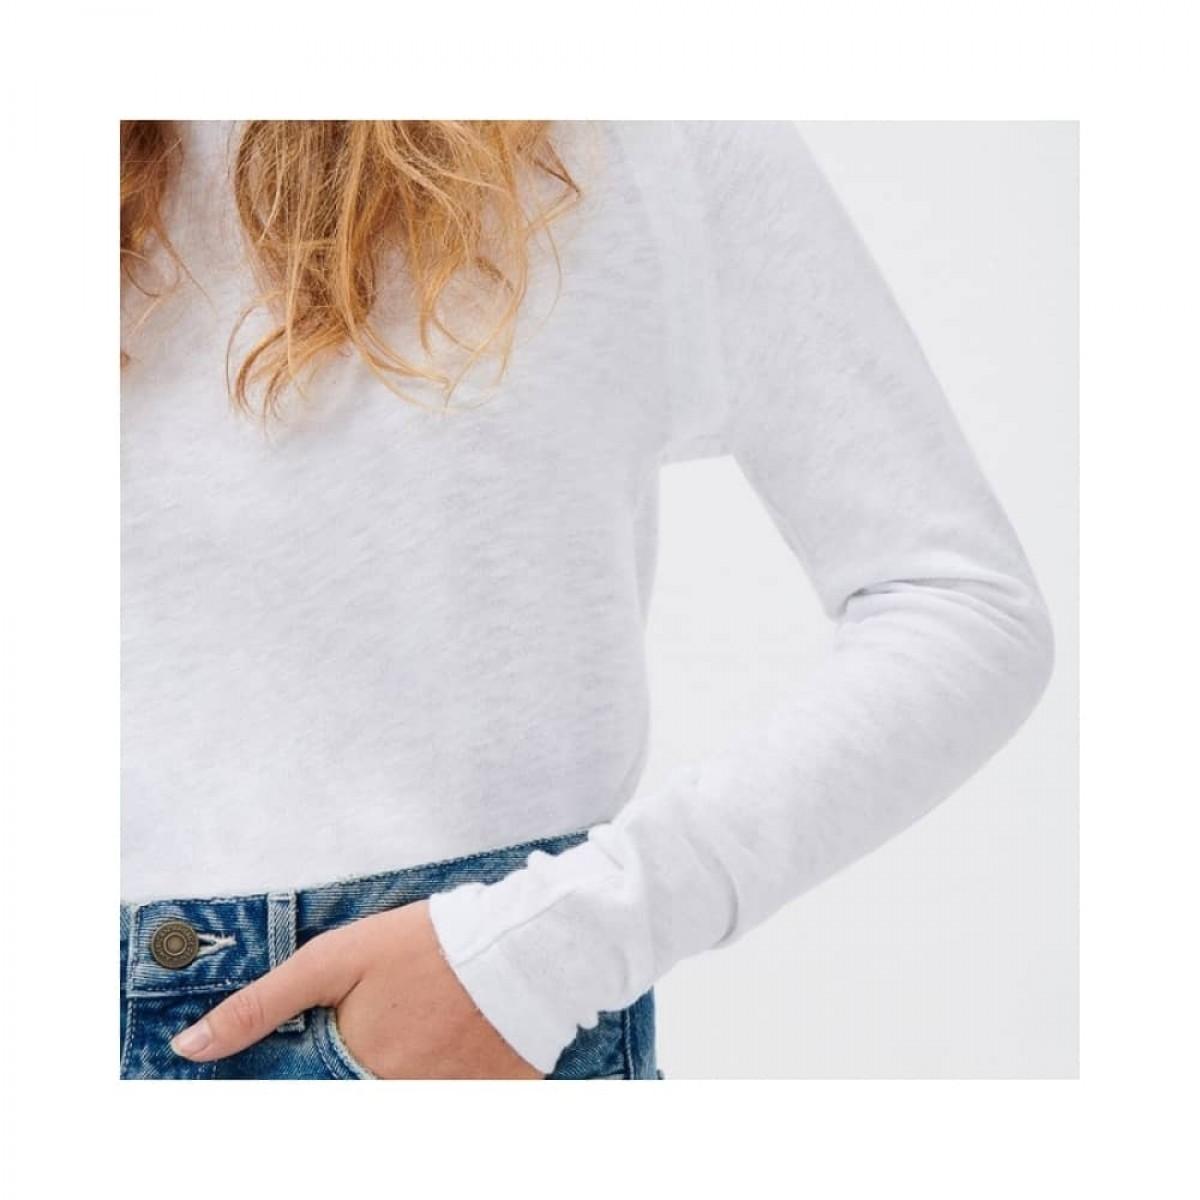 sonoma bluse - white - model detalje